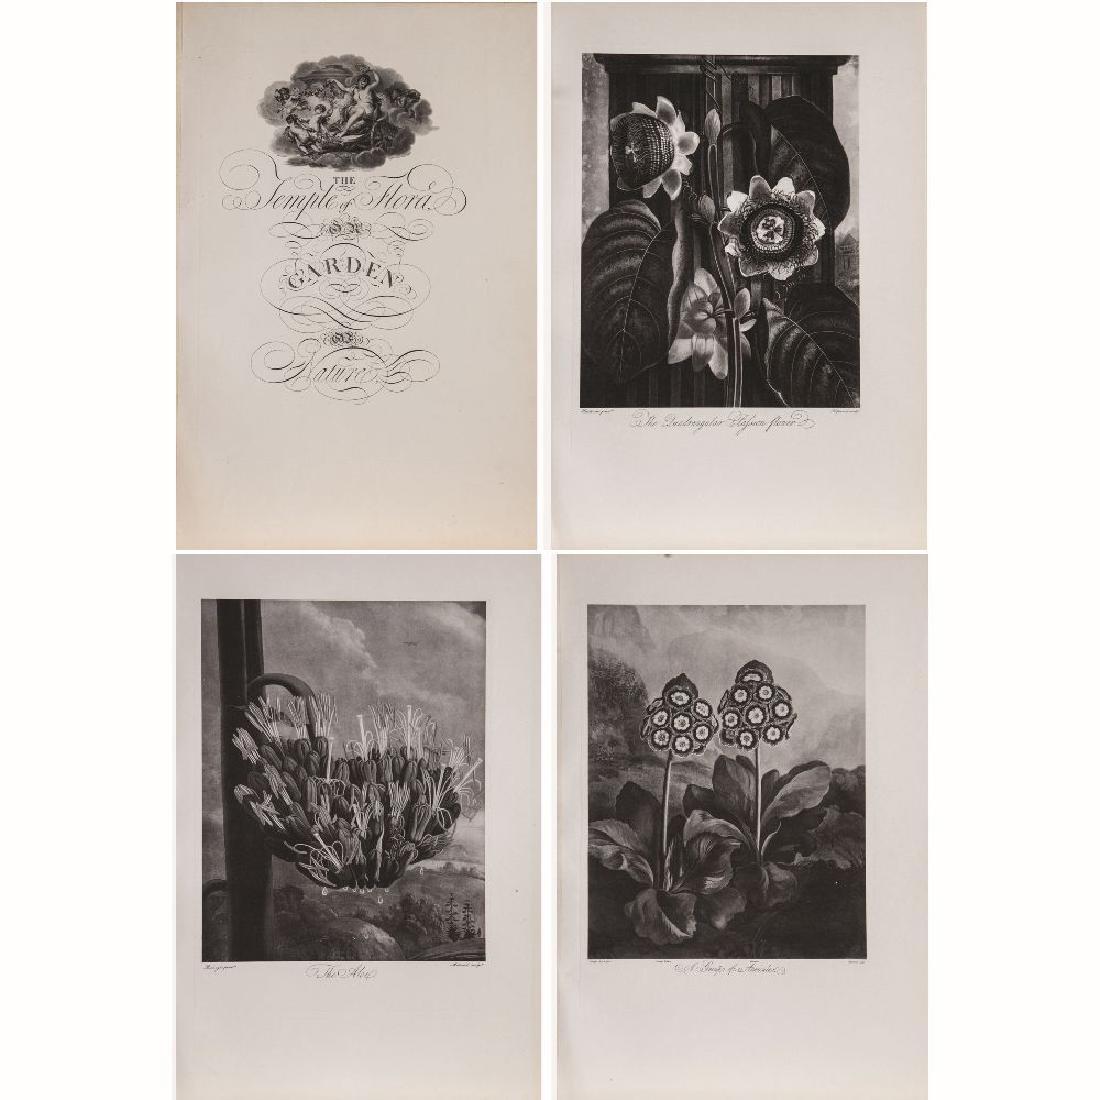 A Partial Copy of Robert John Thornton's 'Temple of